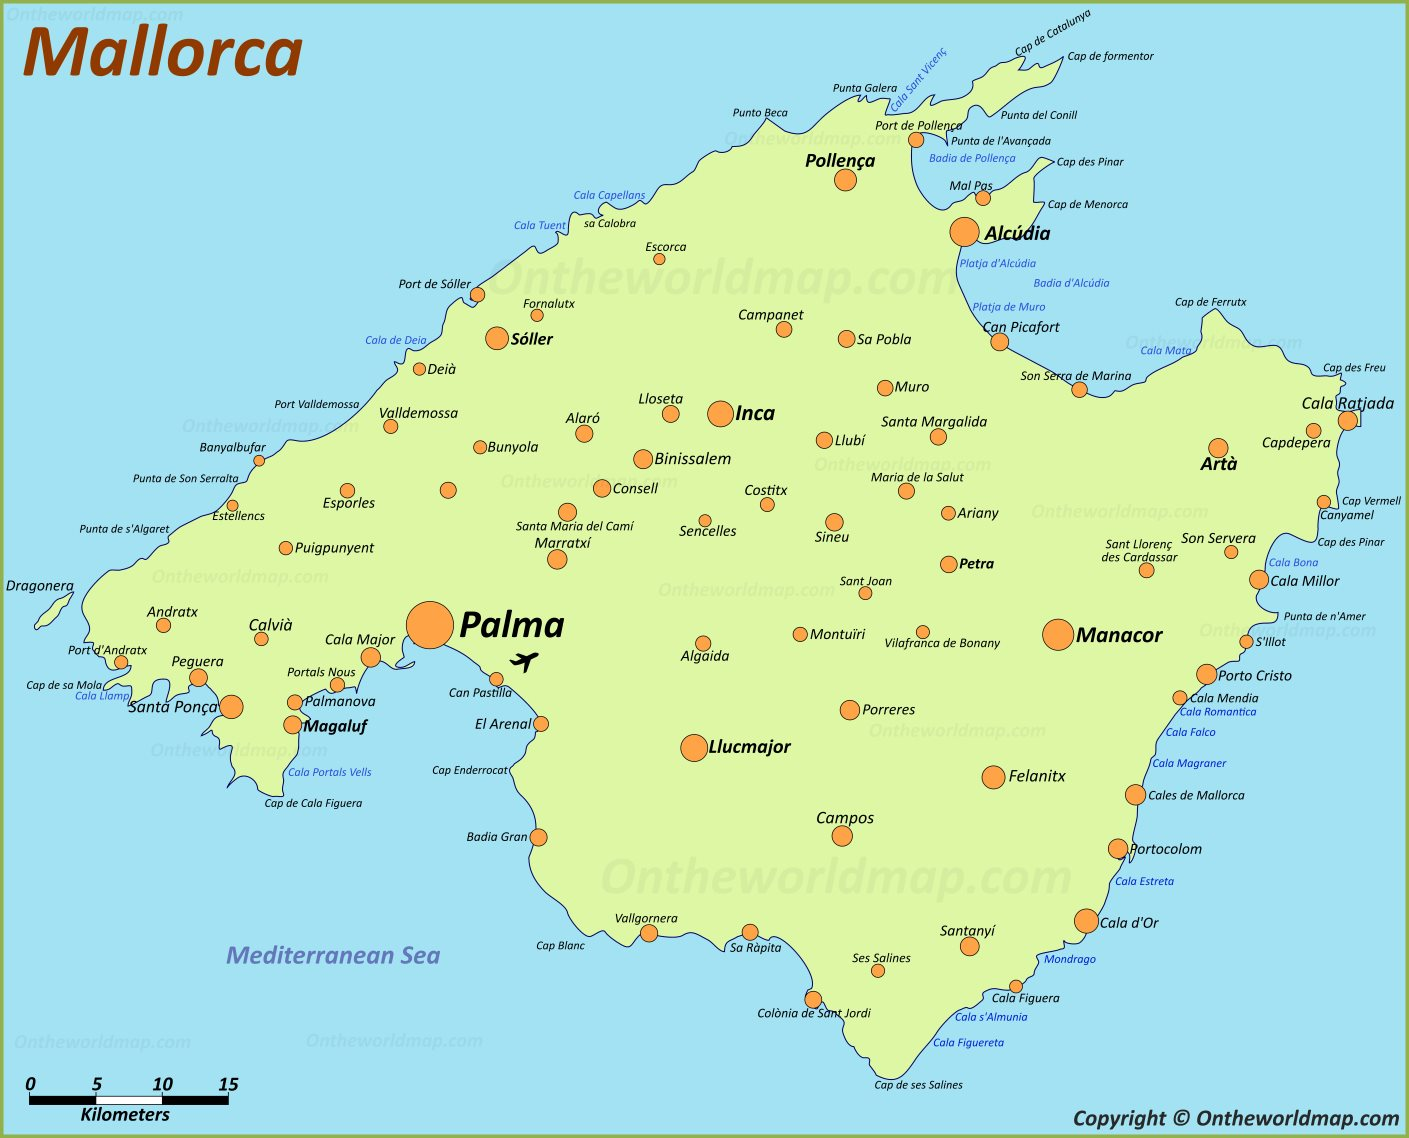 Majorca Maps | Balearic Islands, Spain | Map of Majorca (Mallorca)